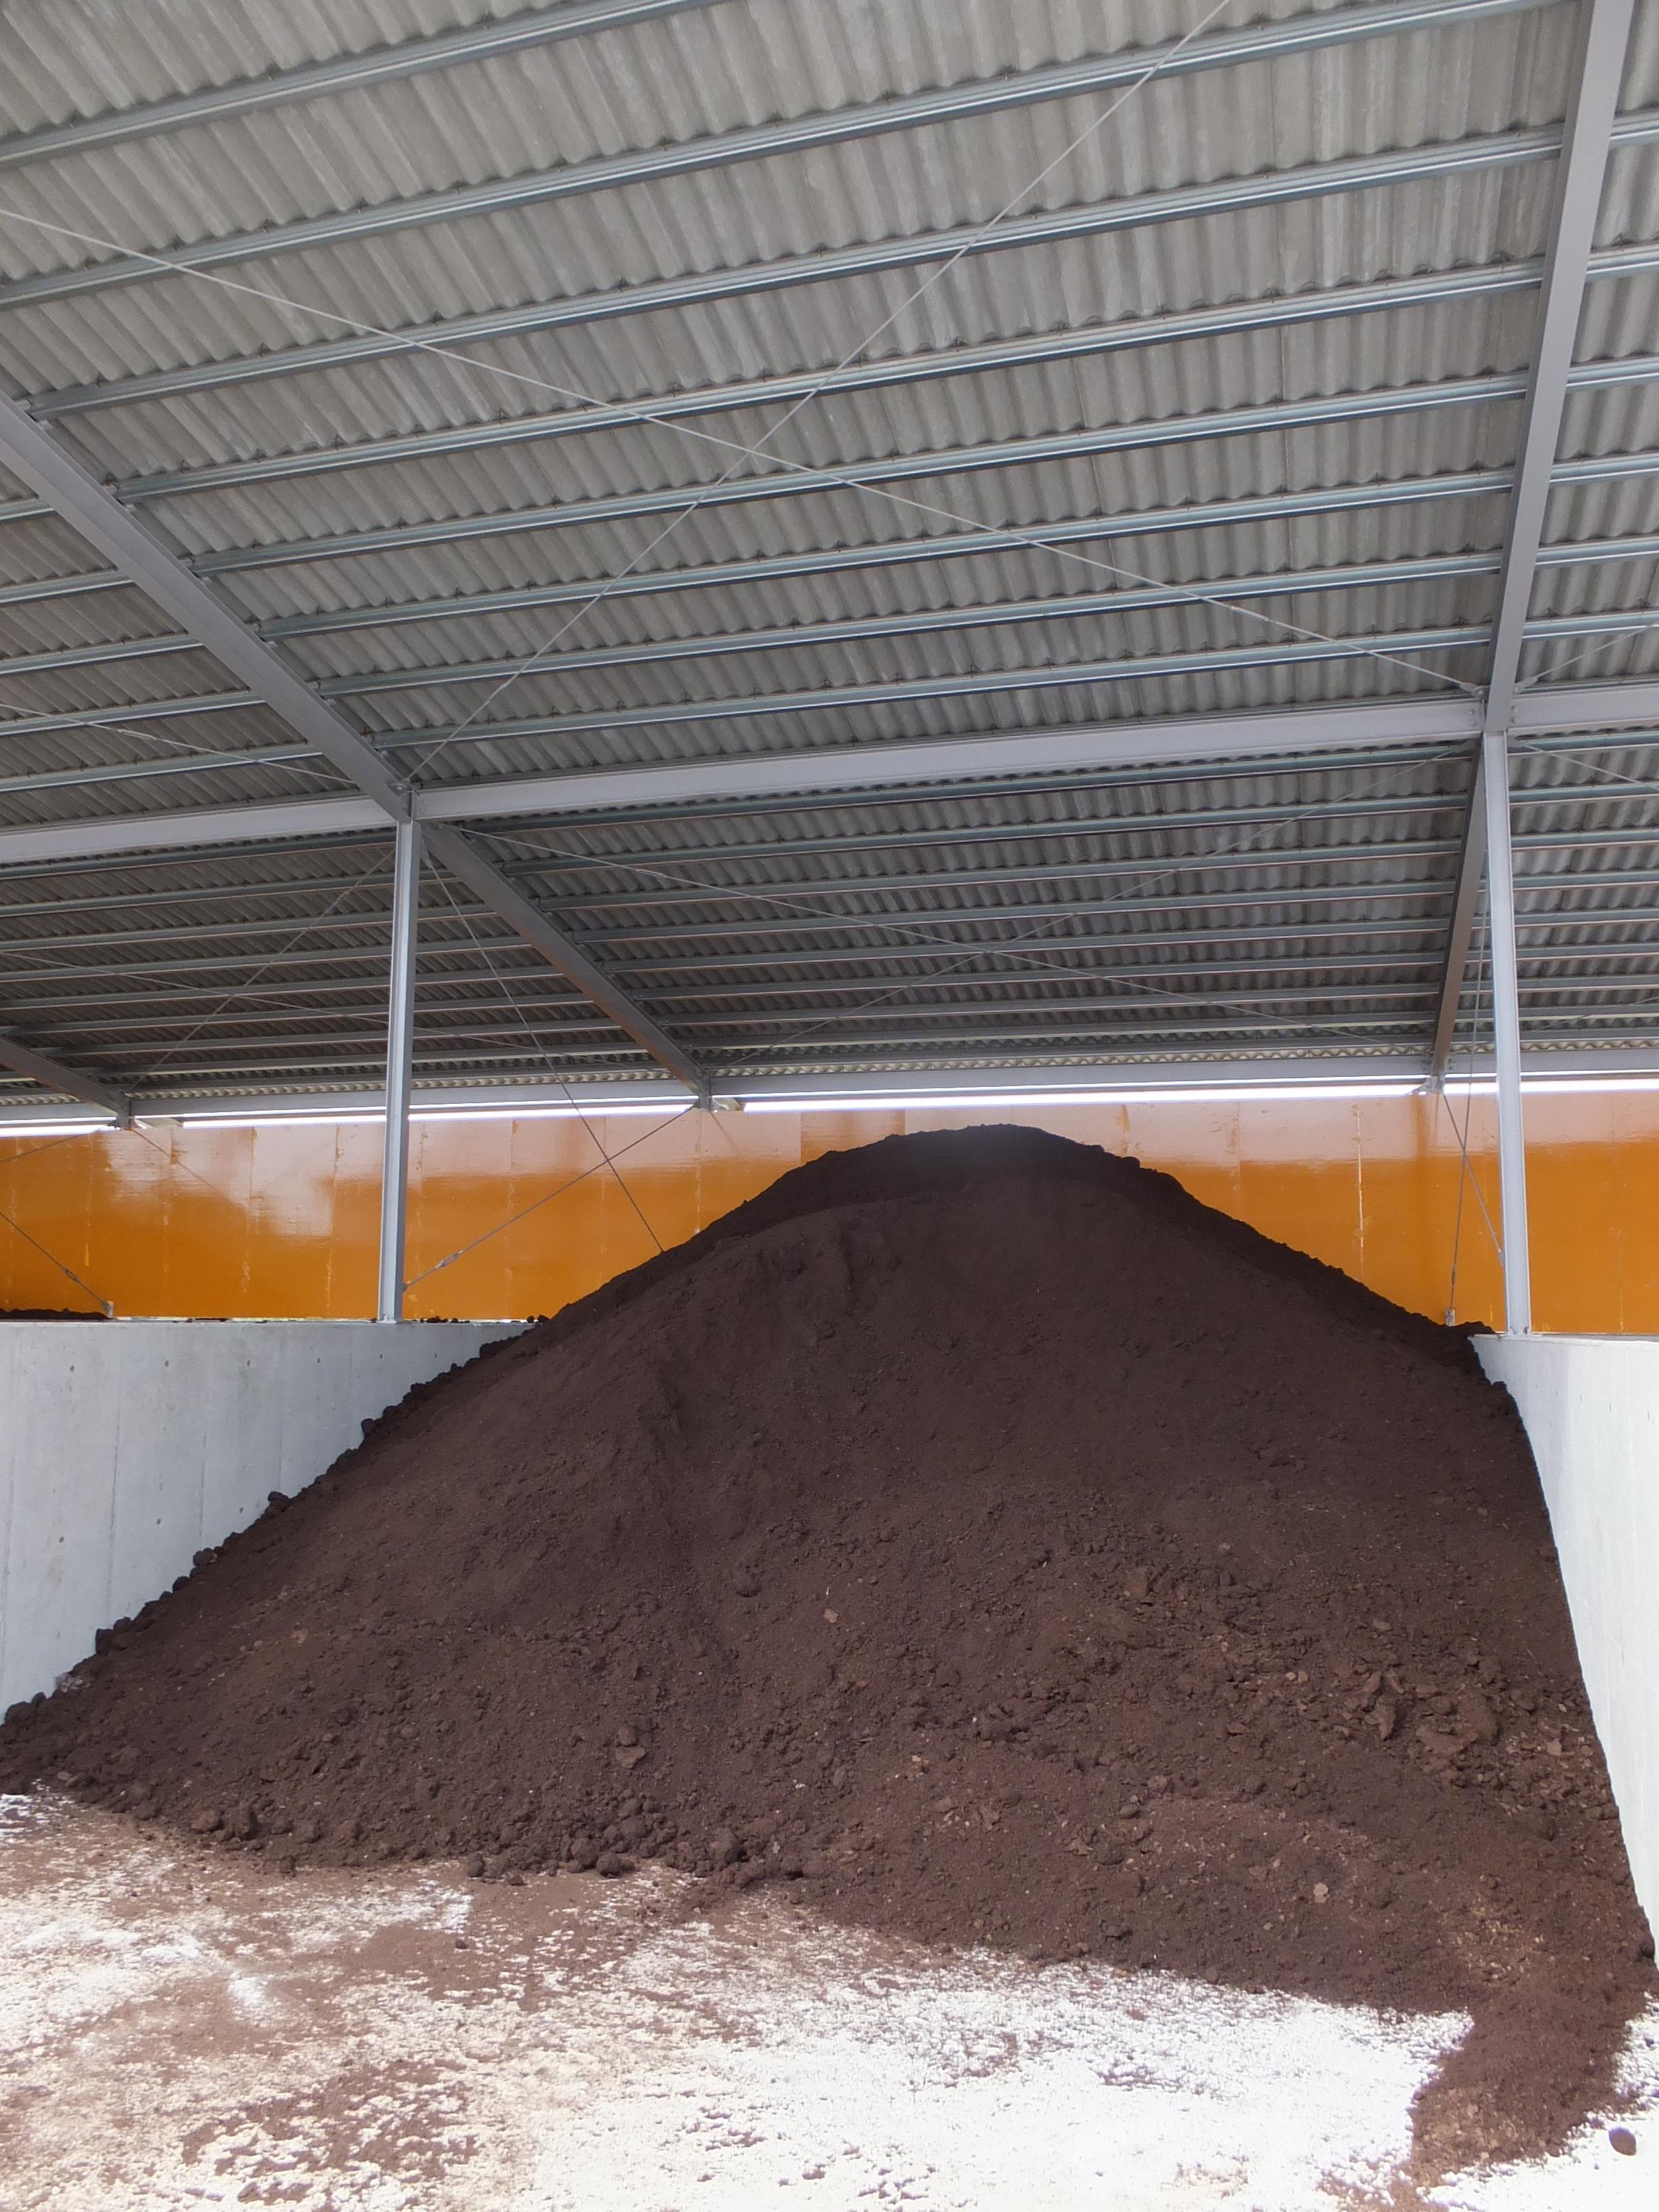 Pre-Composting Room